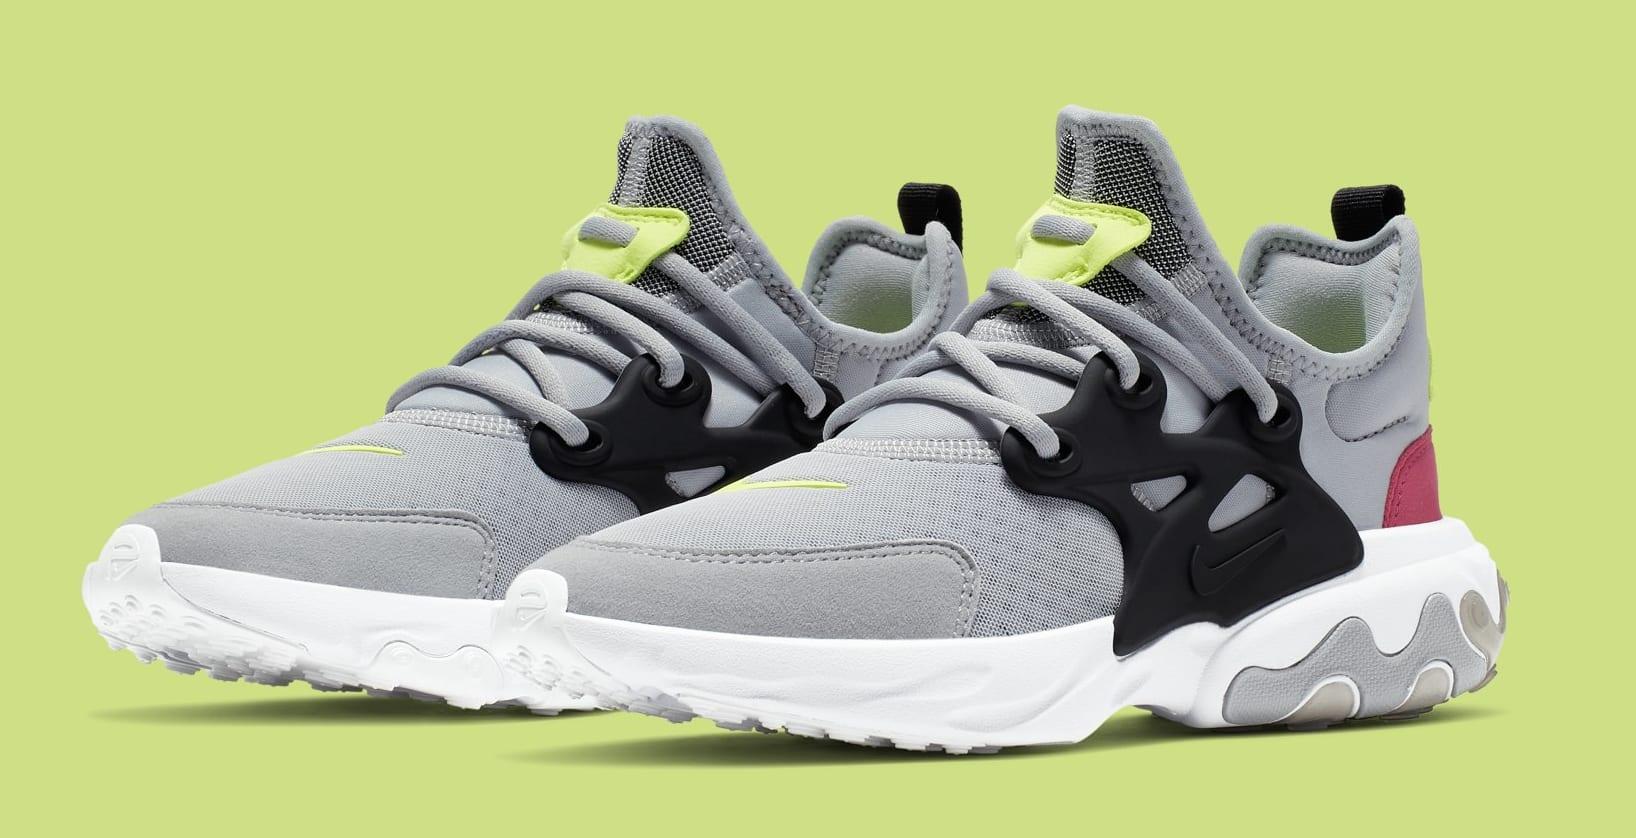 Nike Presto React BQ4002-004 (Pair)